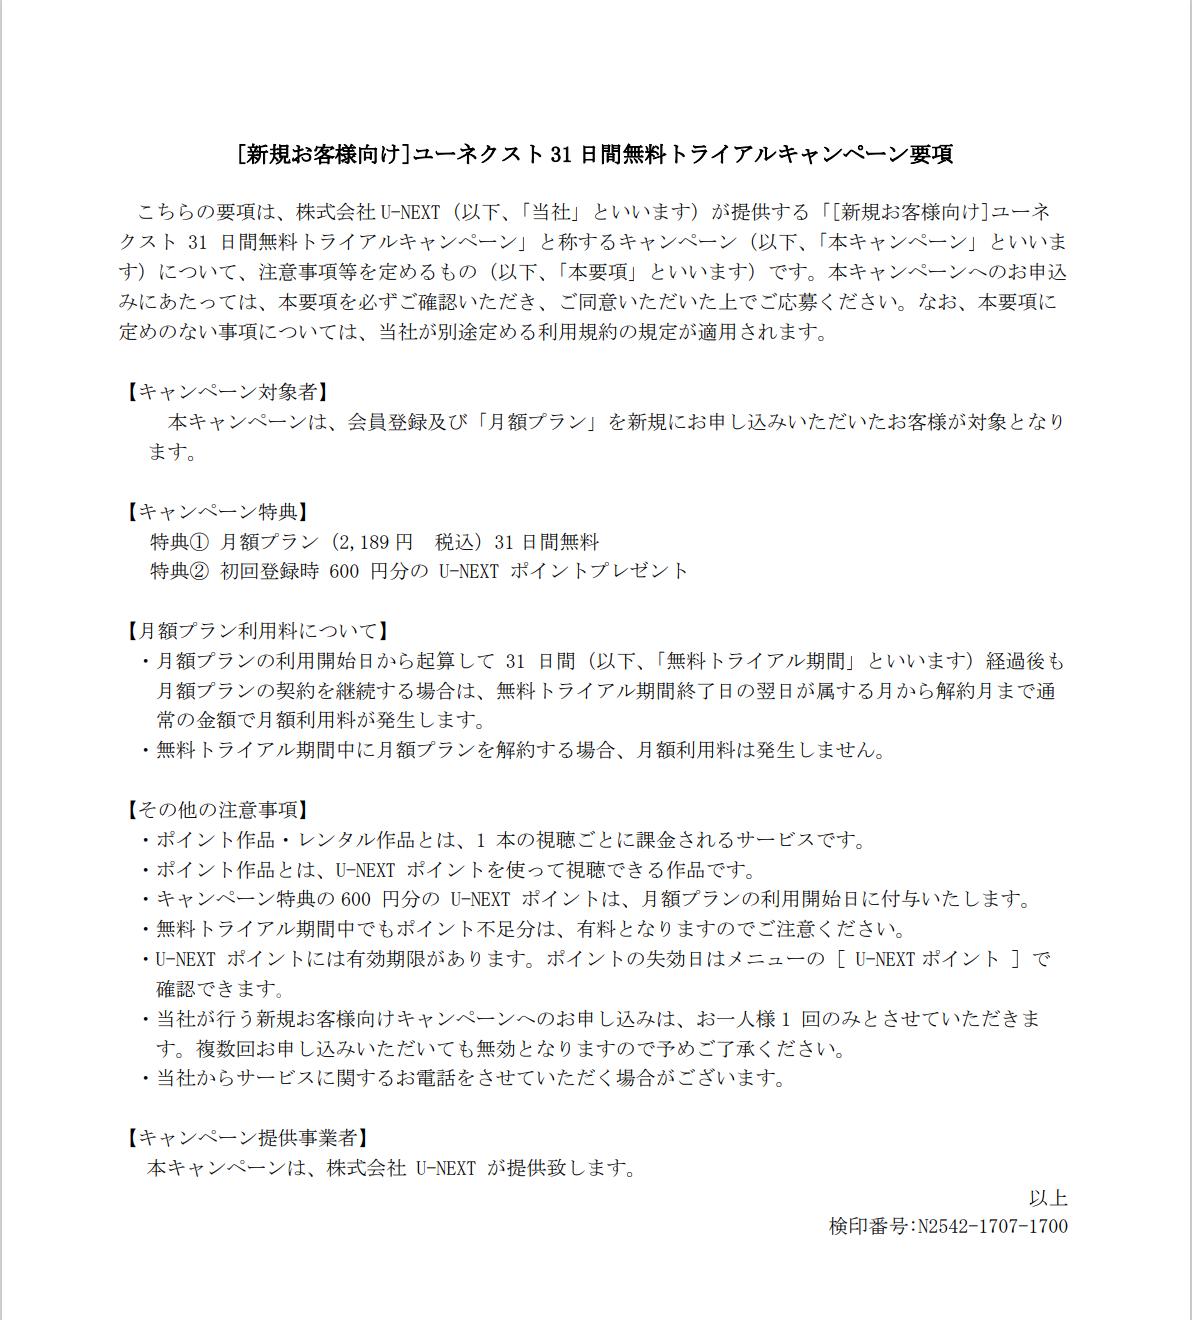 U-NEXT無料トライアルのキャンペーン要項の画面